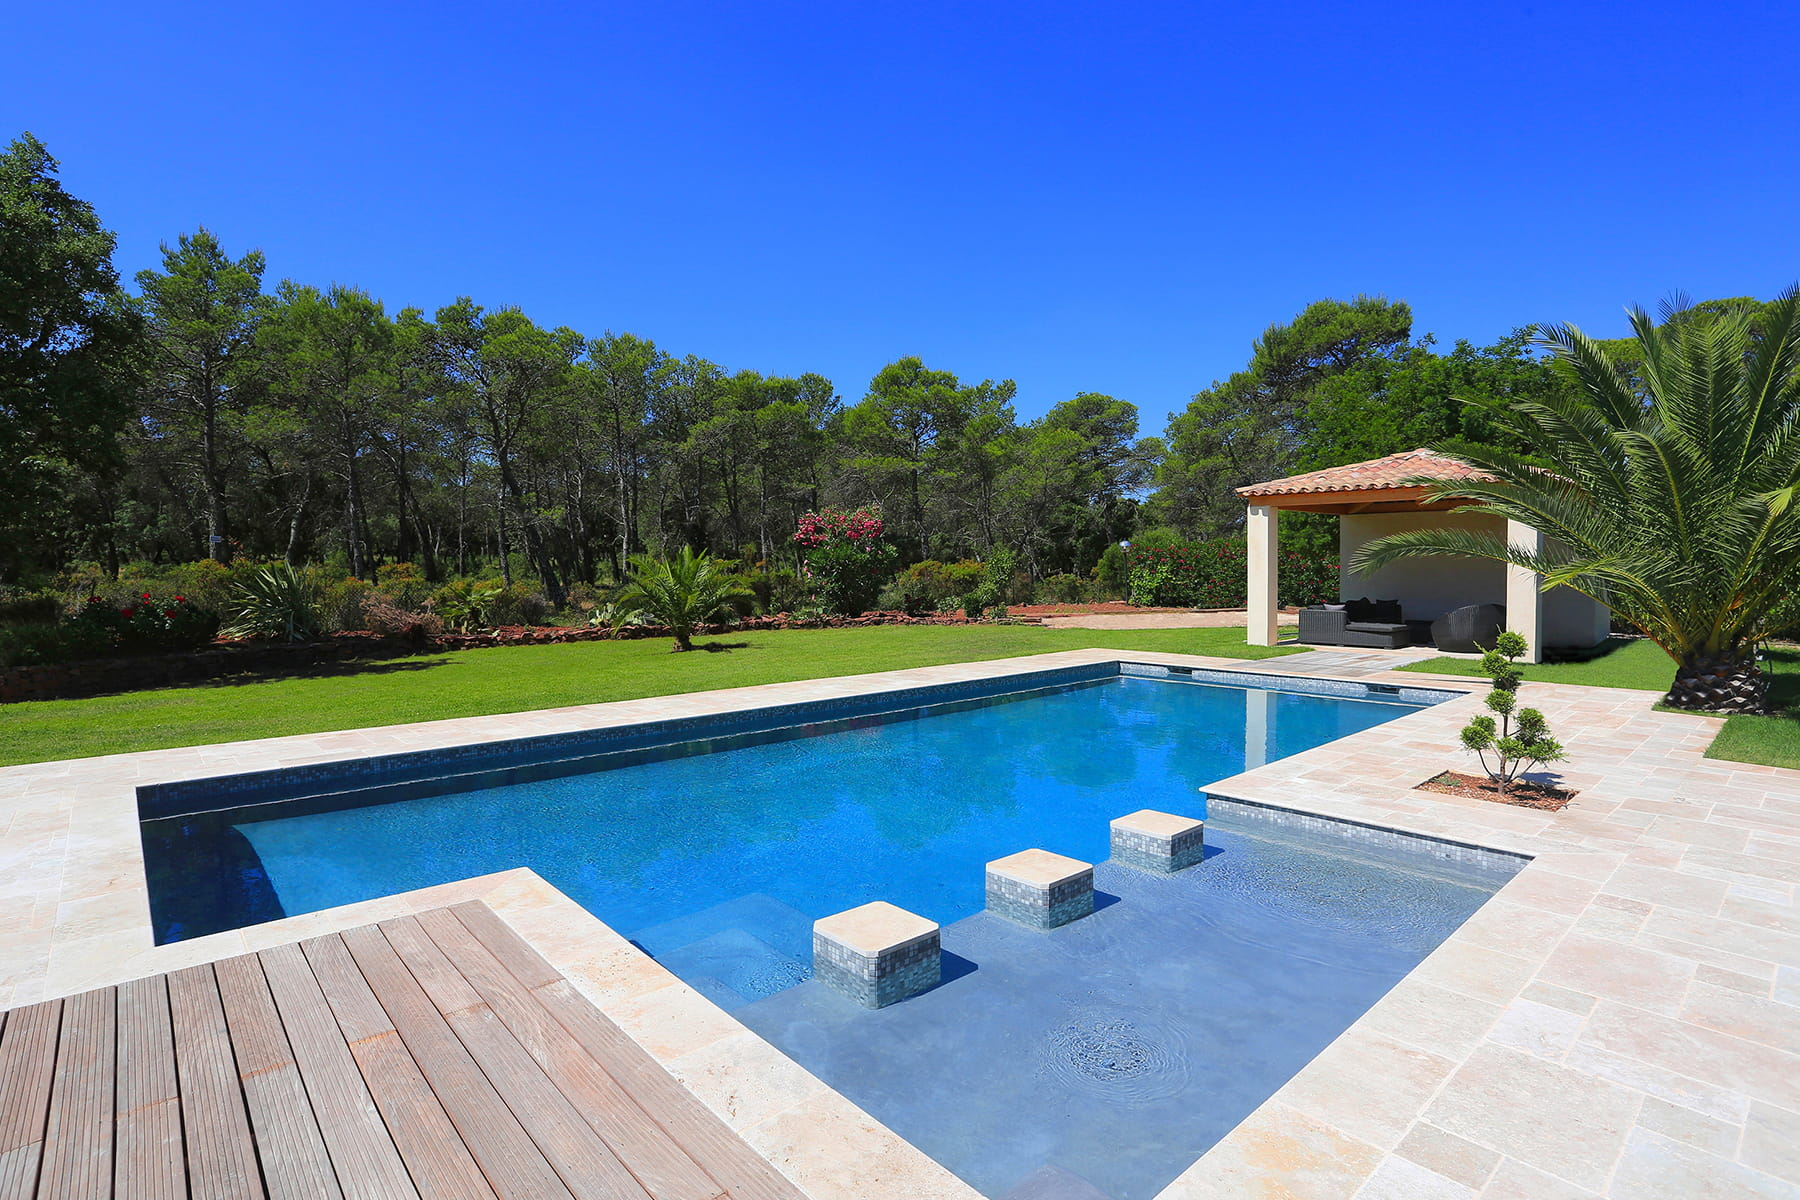 Une plage immerg e originale 25 piscines qui donnent for Construction piscine originale